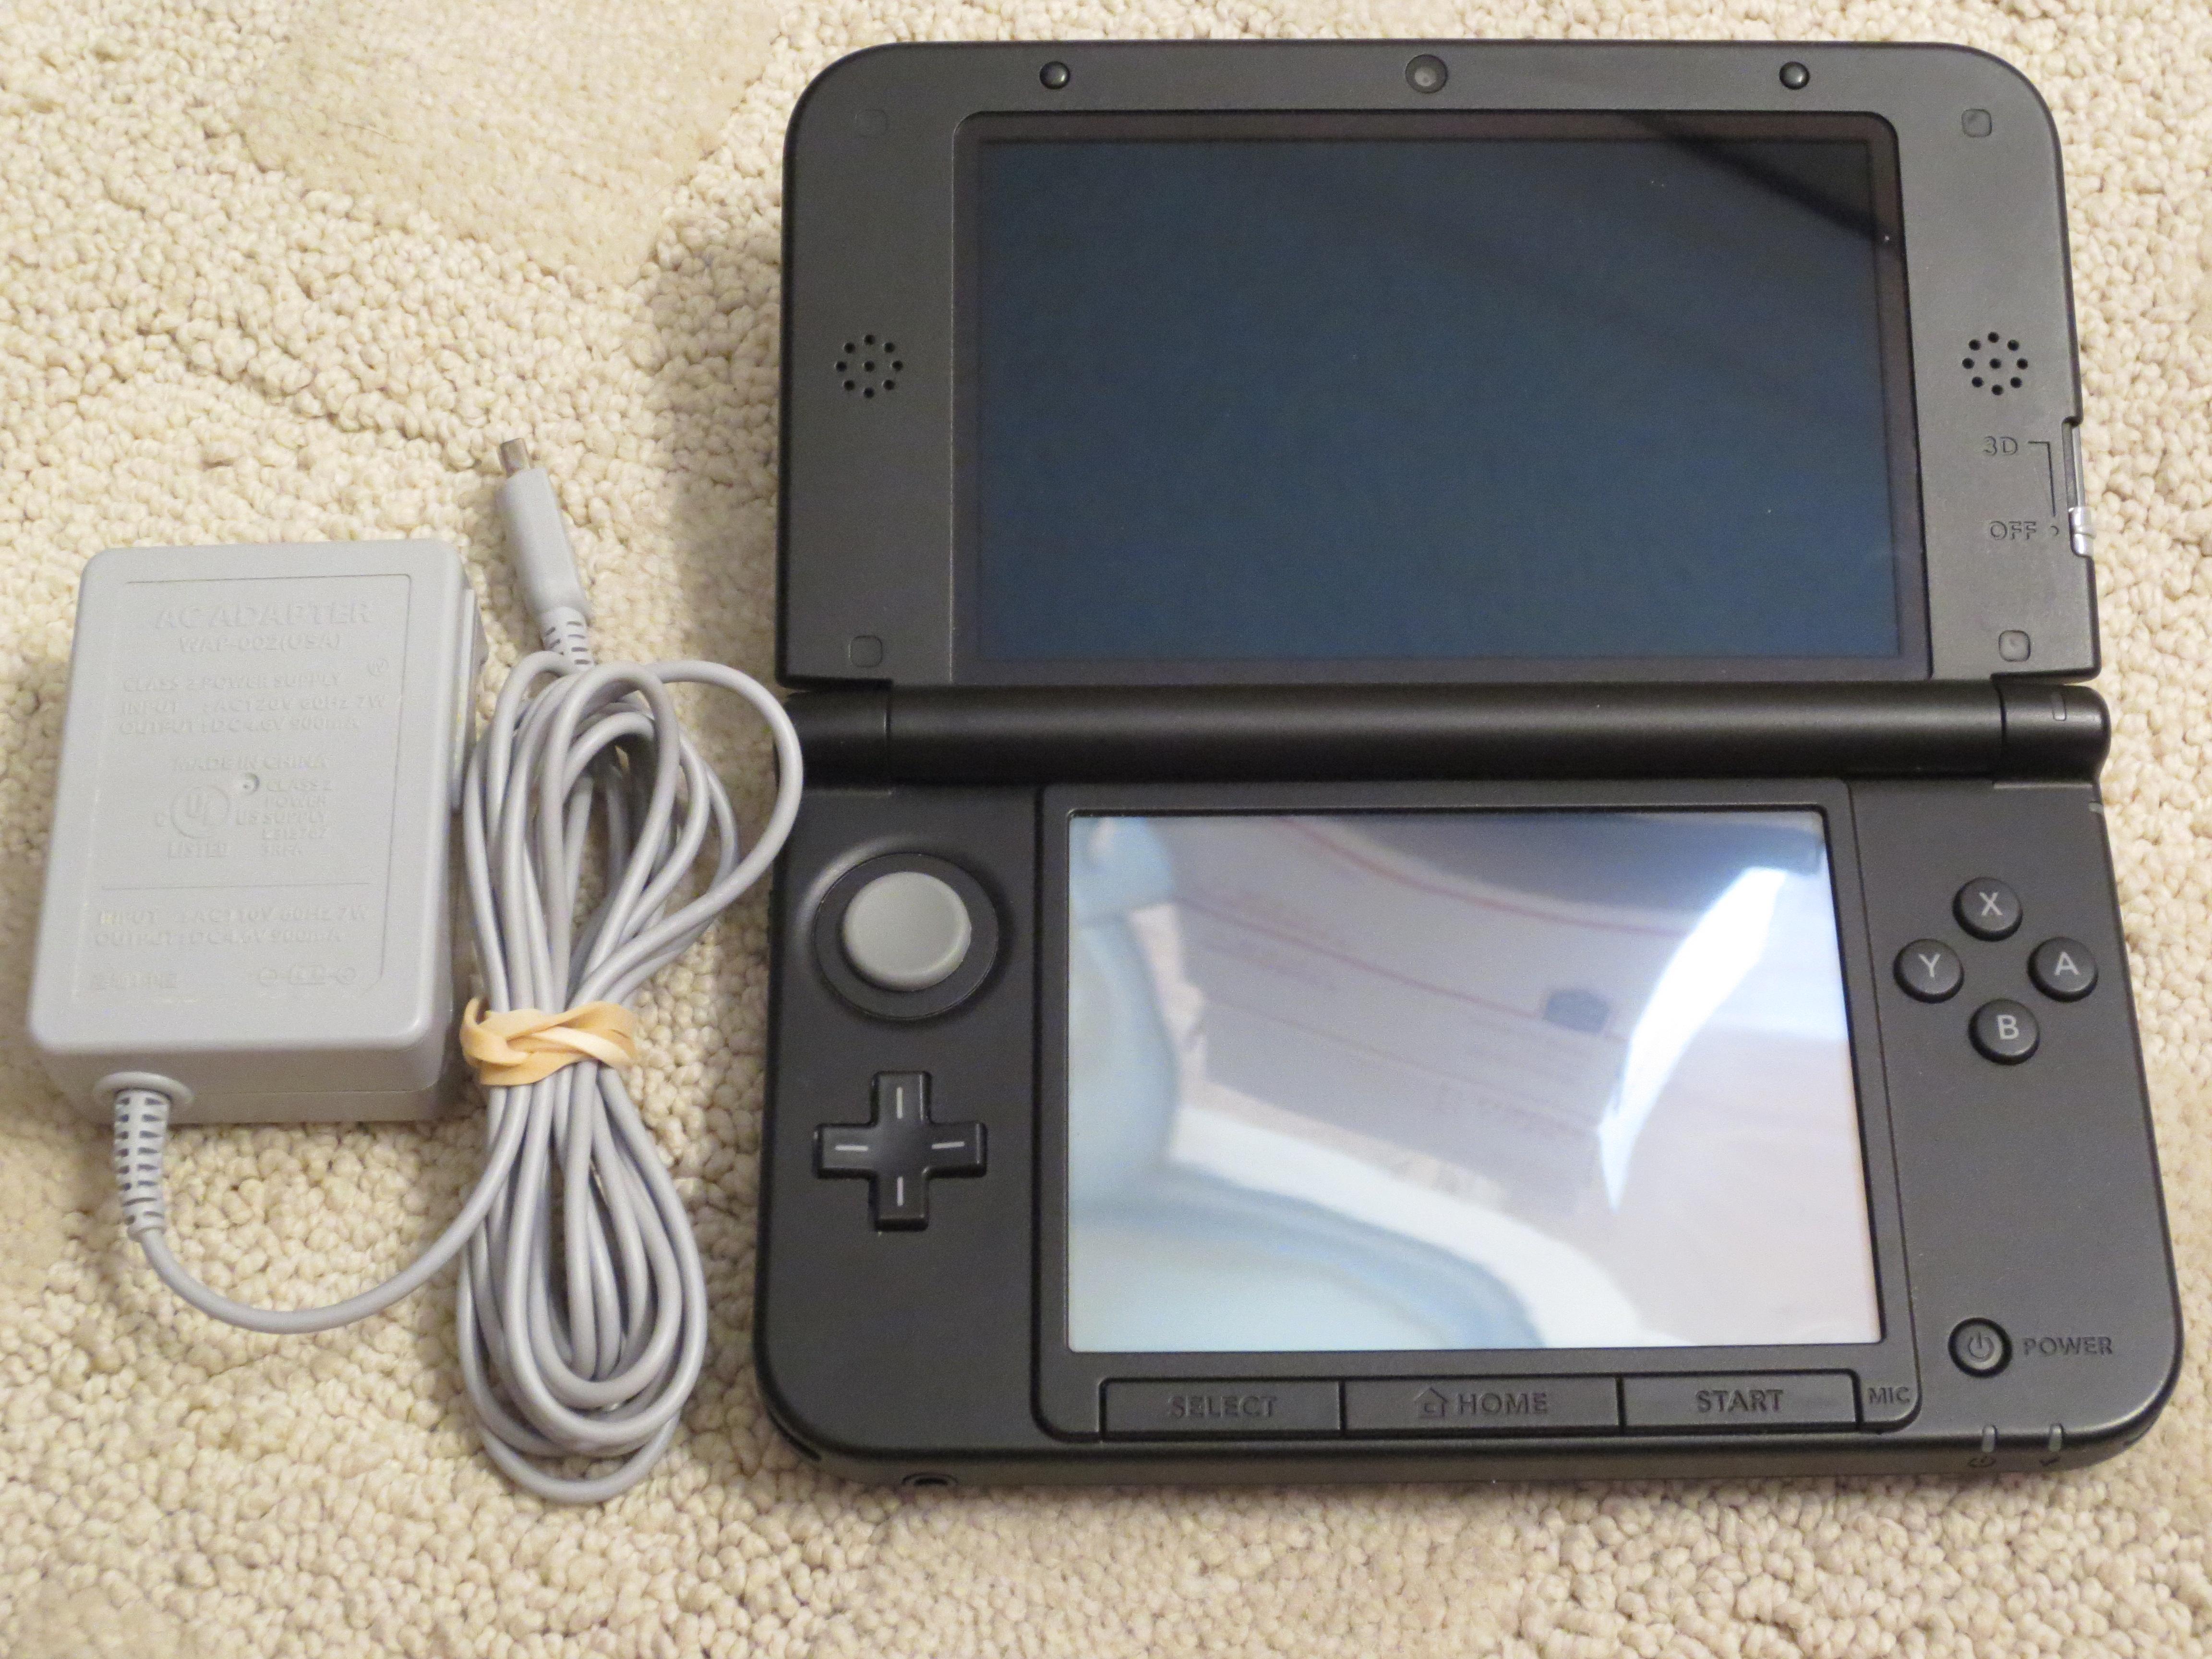 Nintendo 3ds xl latest model blue black handheld system sprsbka1 ebay - Nintendo 3ds handheld console ...